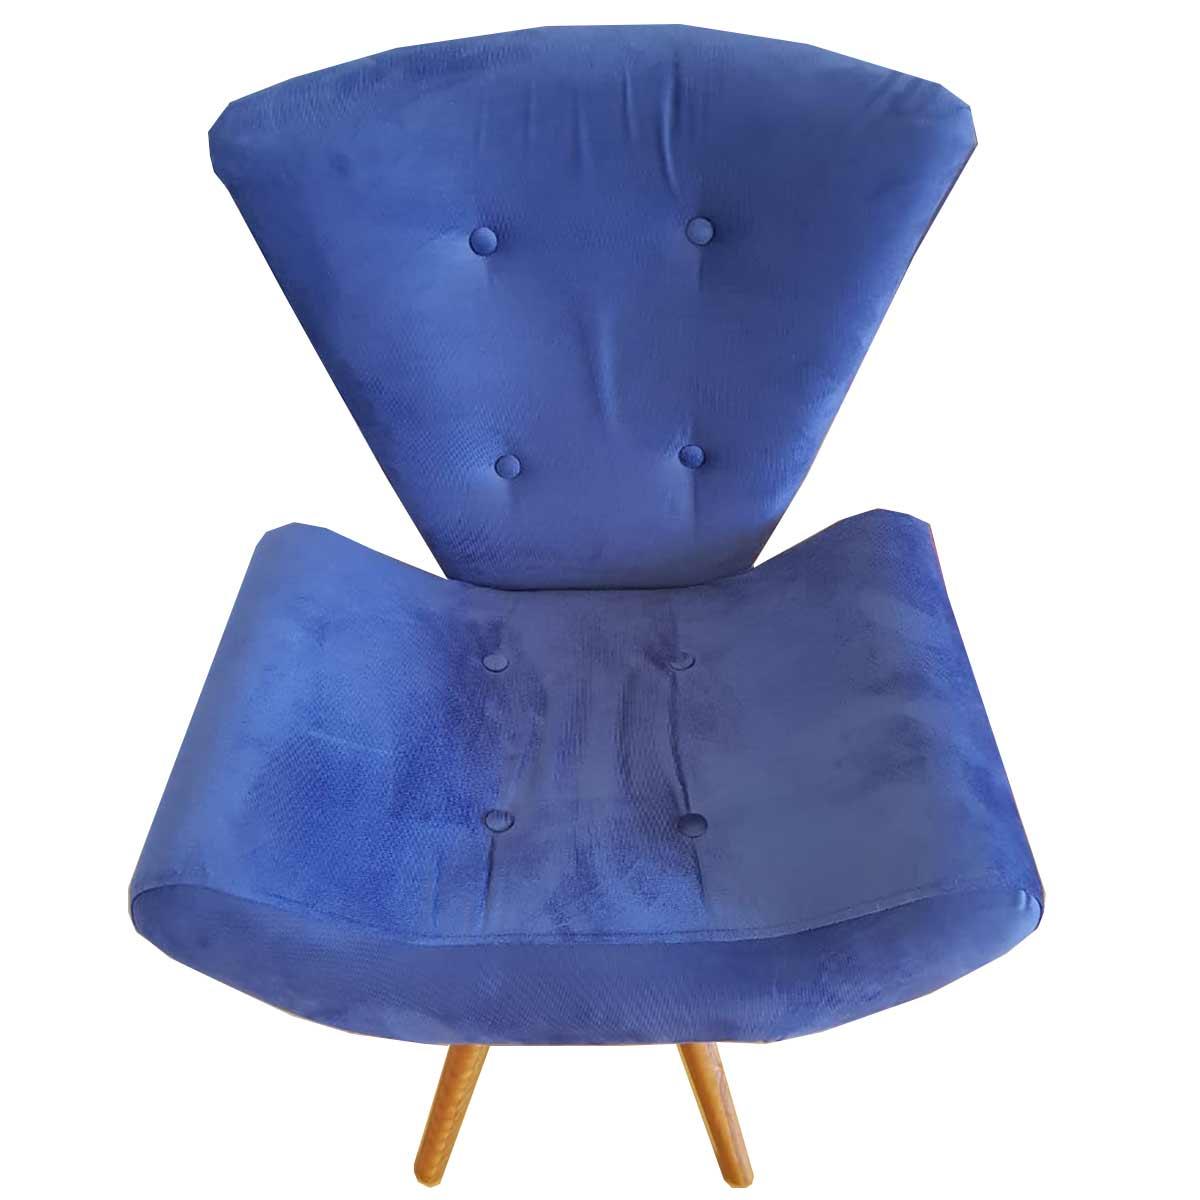 Kit 2 Poltronas Decorativas Diana Animale Azul Marinho